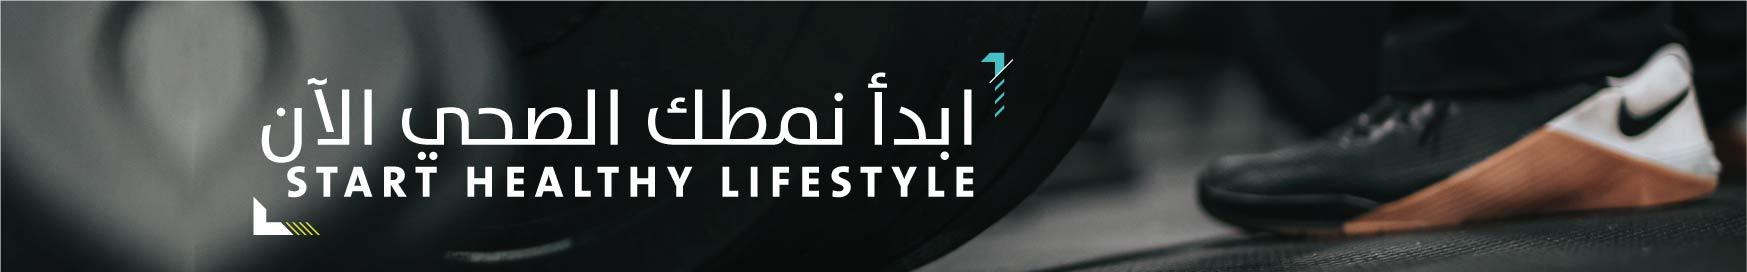 Sportsfitness_Helthylifestylewide_WebMsiteApp